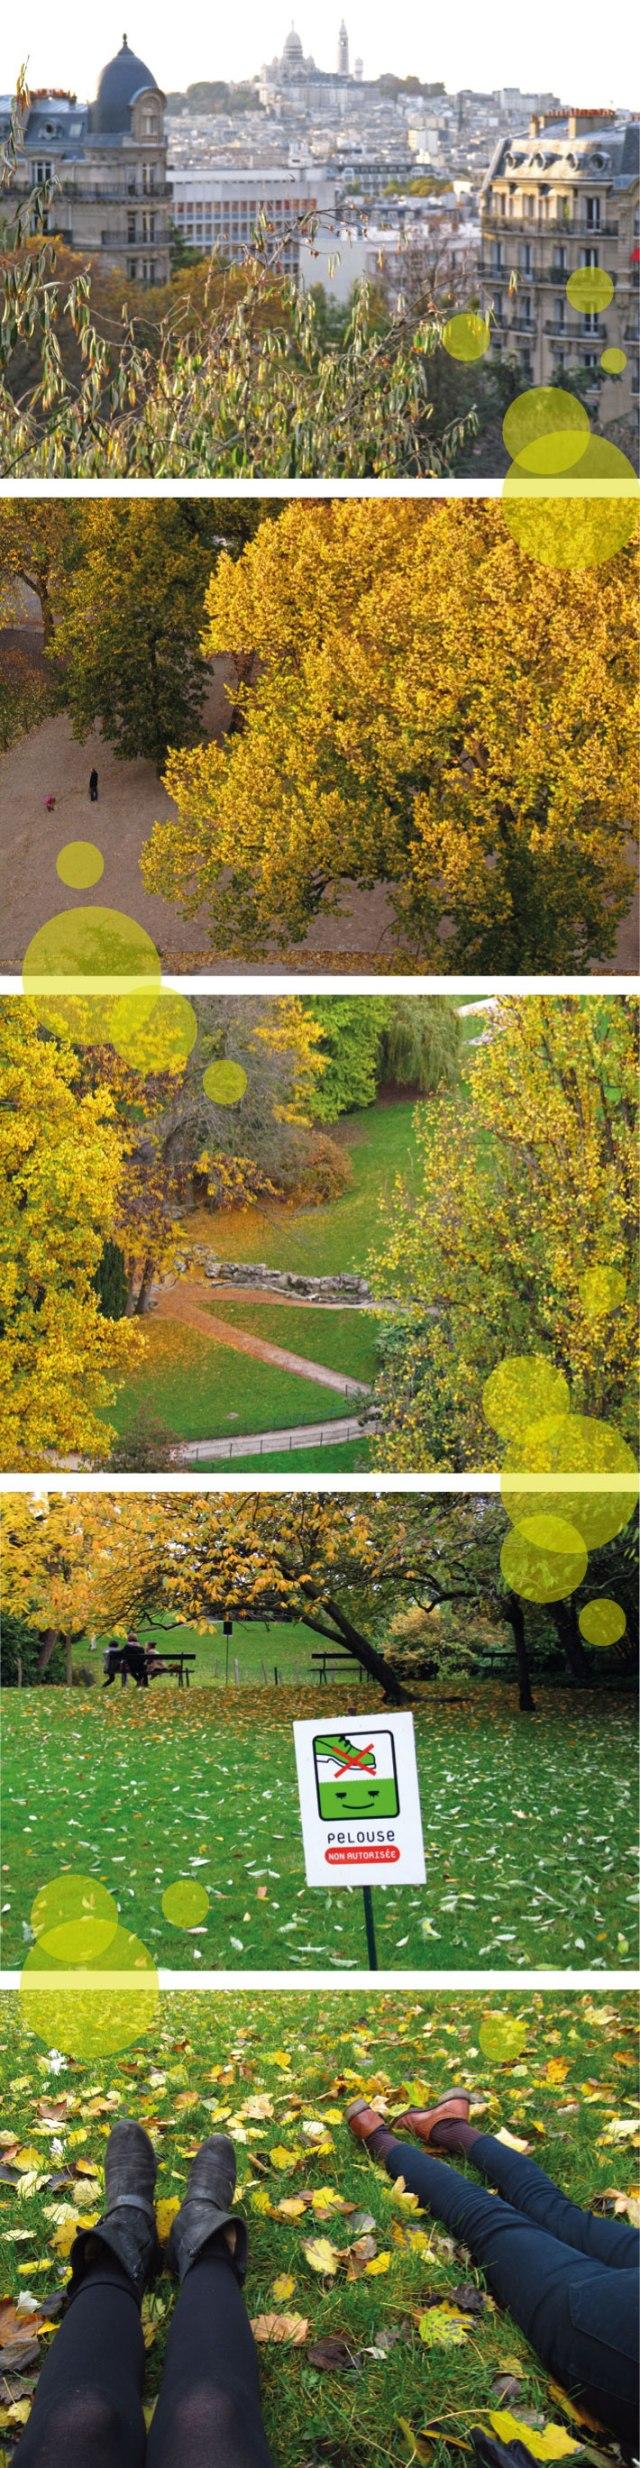 Littlelulu_autumn_parks